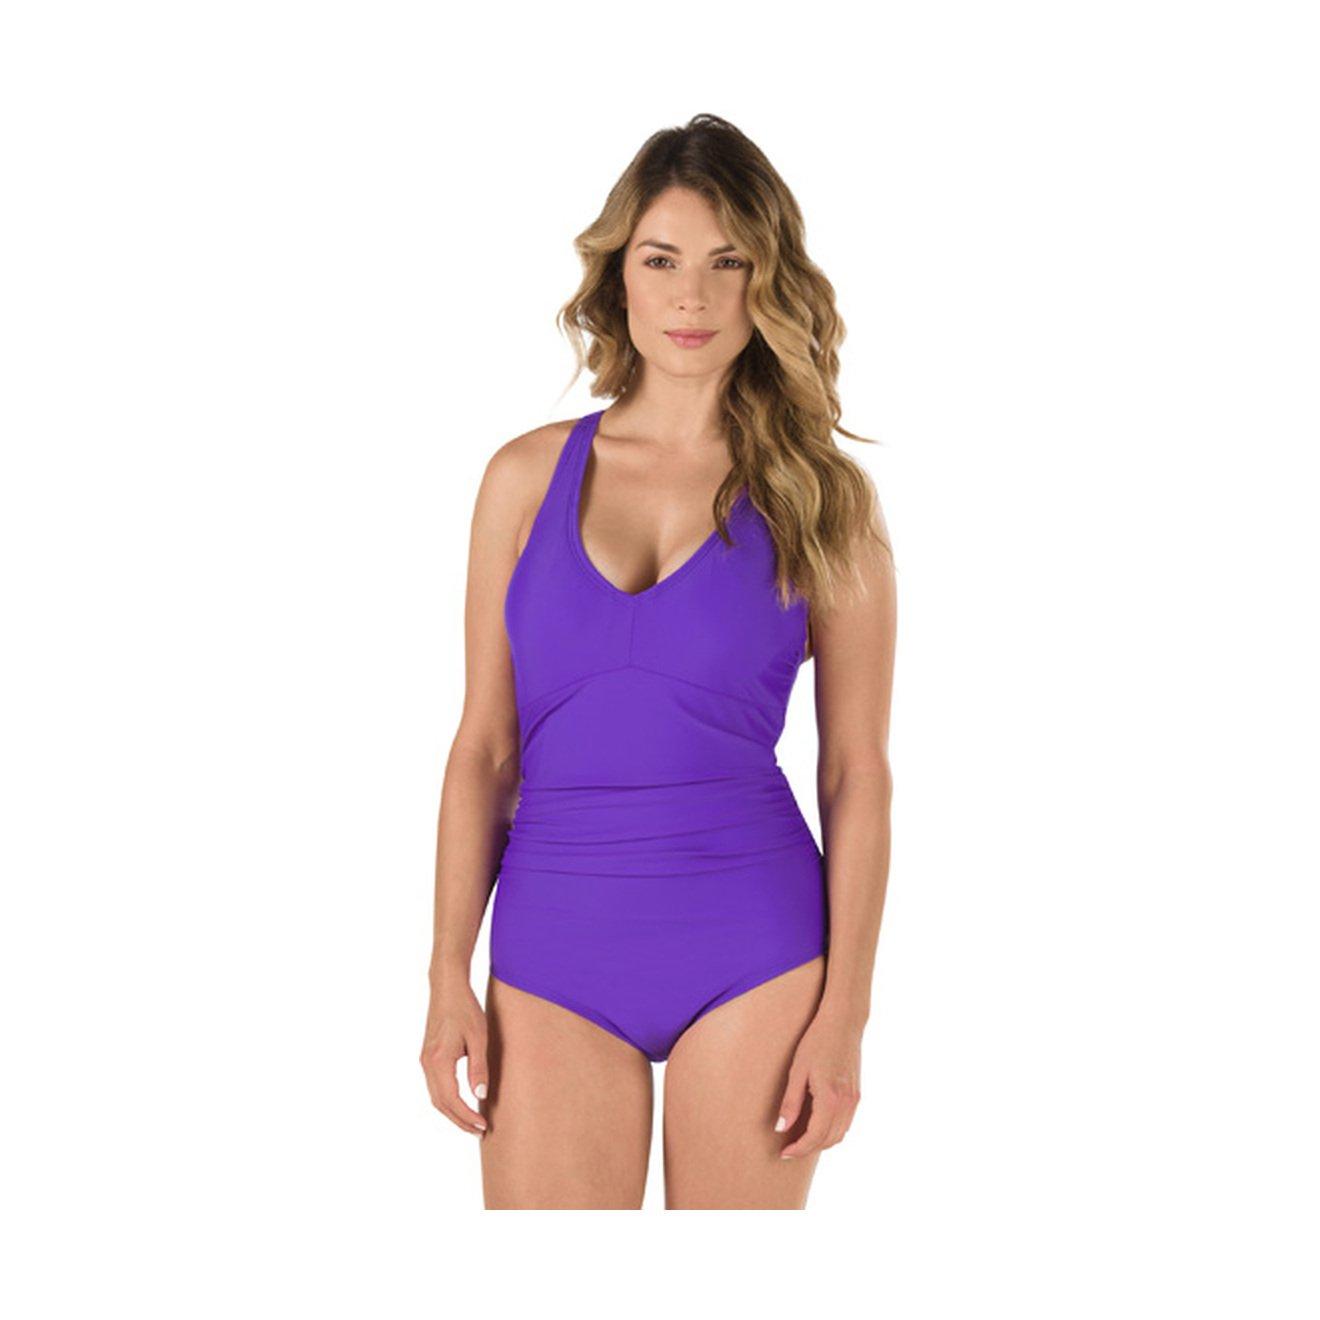 Speedo Womens V-Neck One-Piece Swimsuit with Underwire